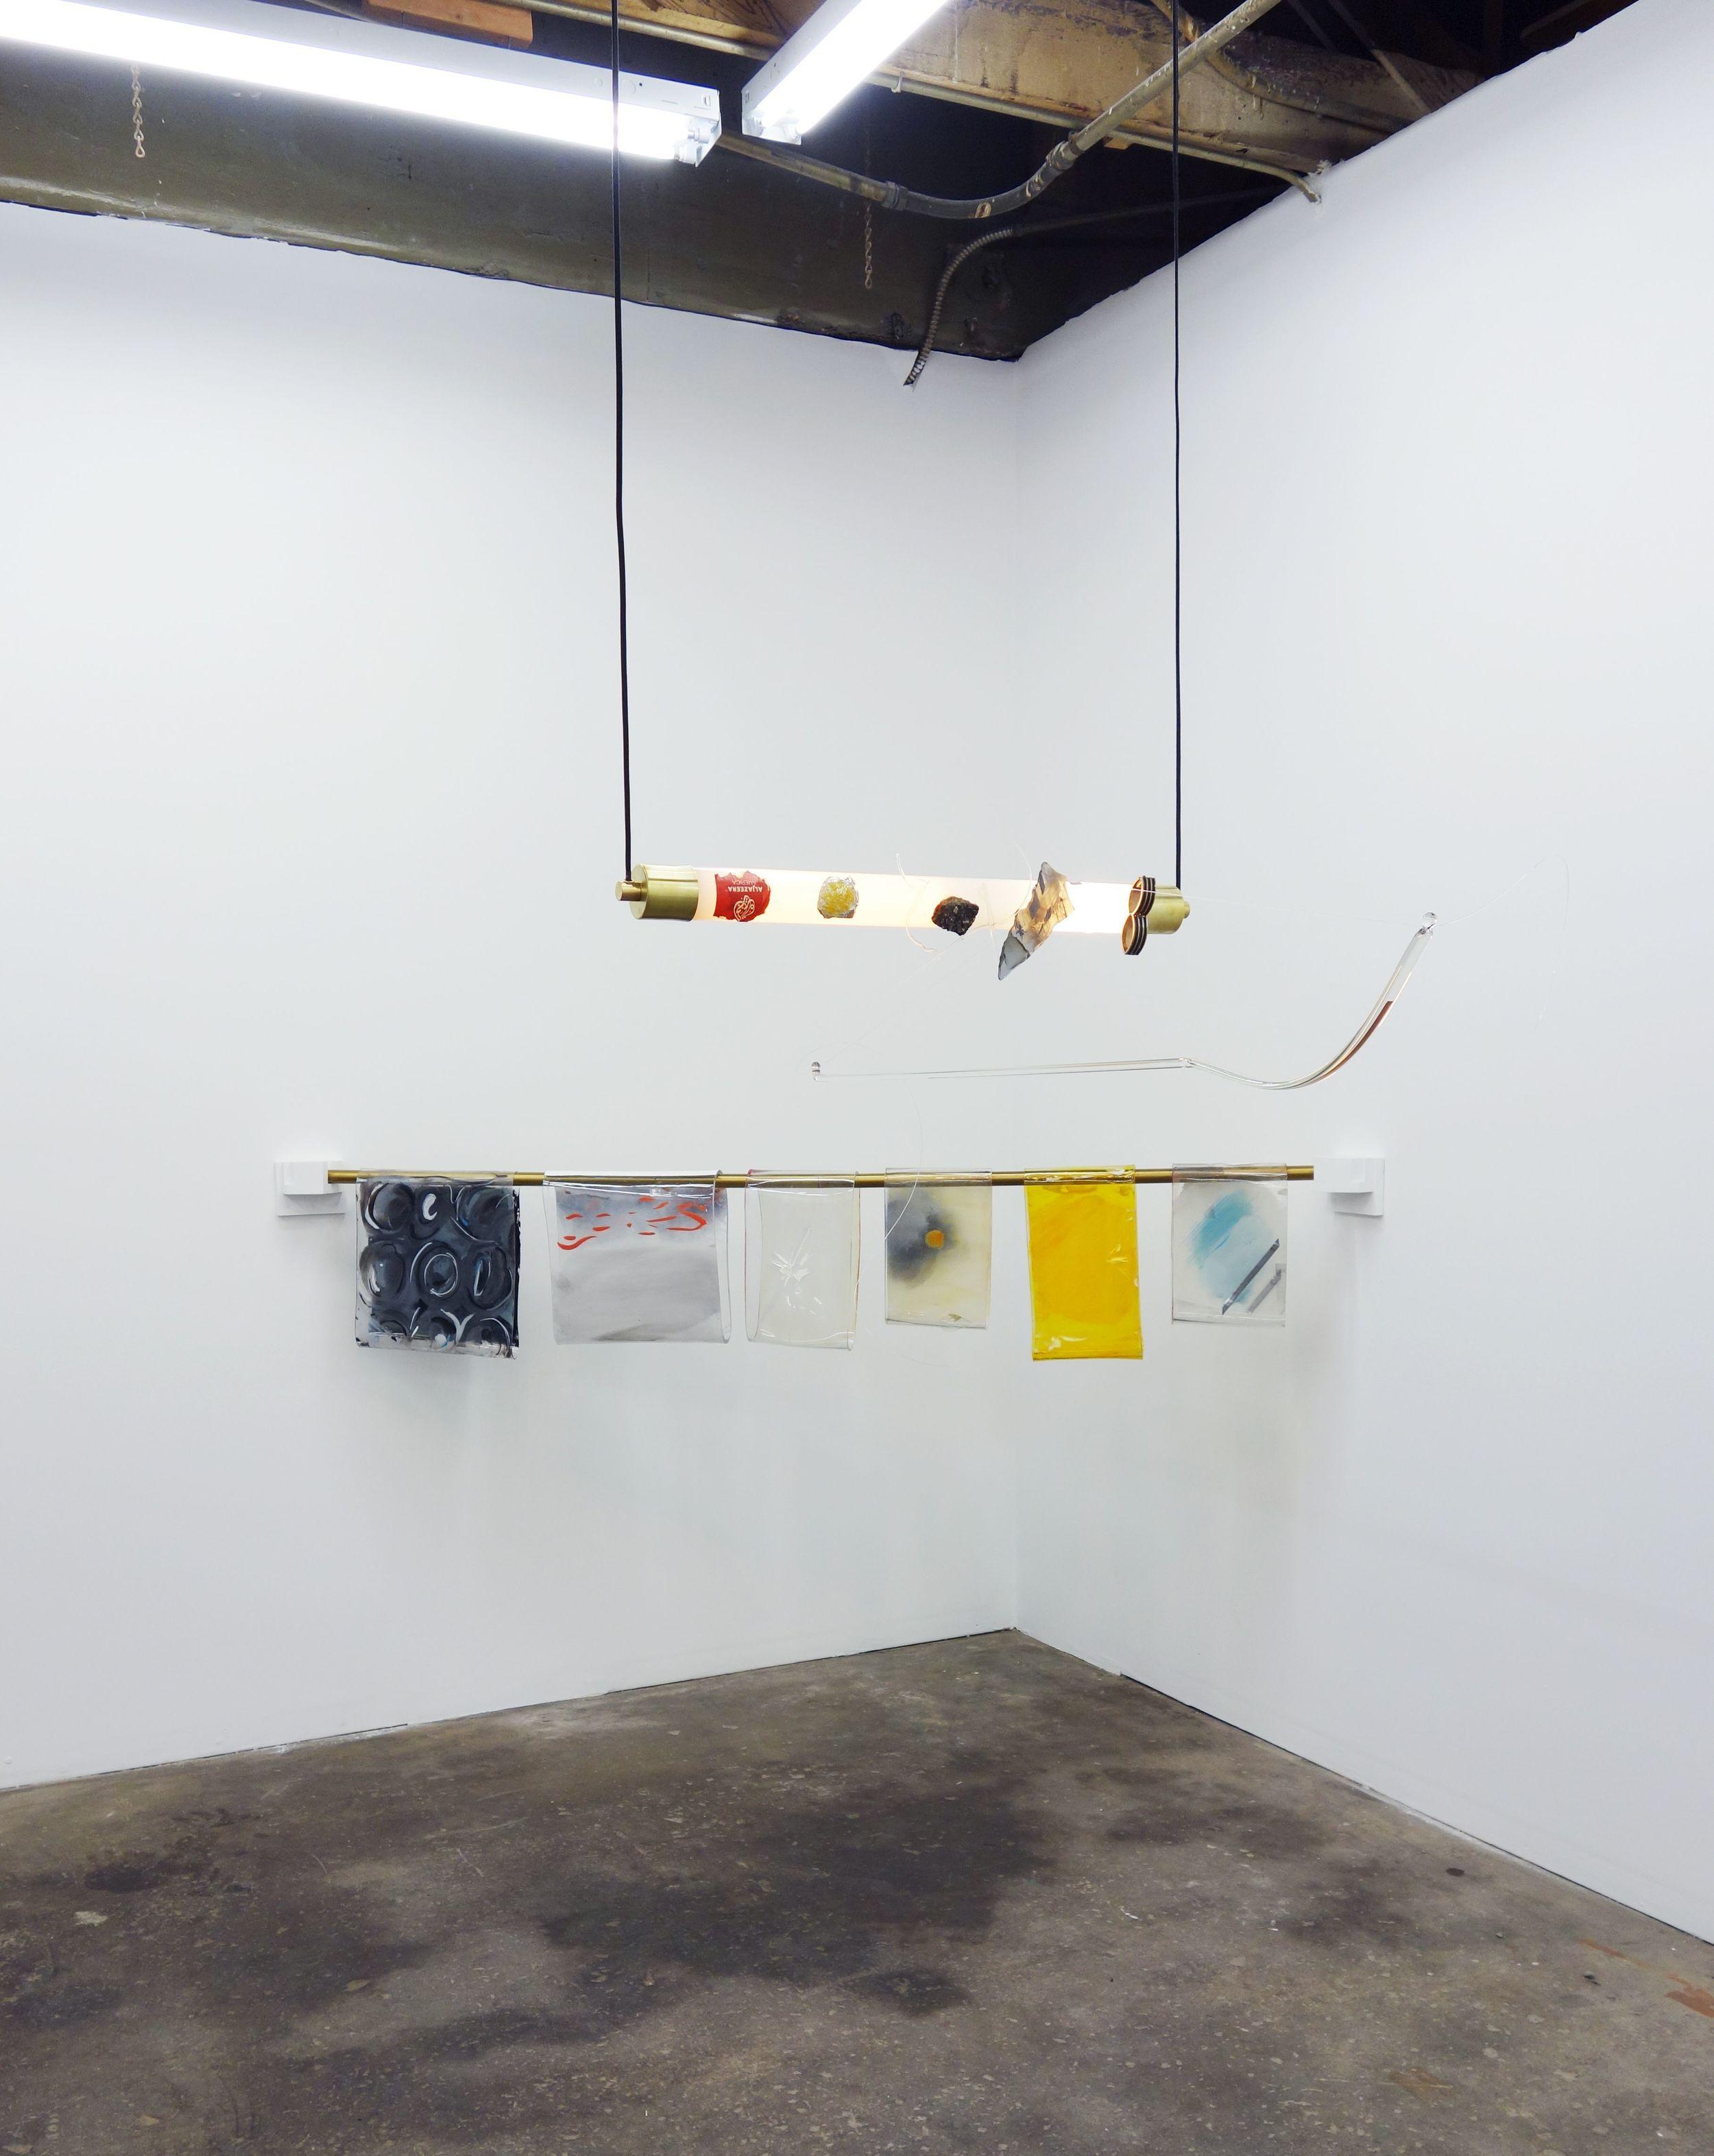 Olivia Booth, (foreground) Al Jazeera Piece, 2015 (background) Glint piece, 2015